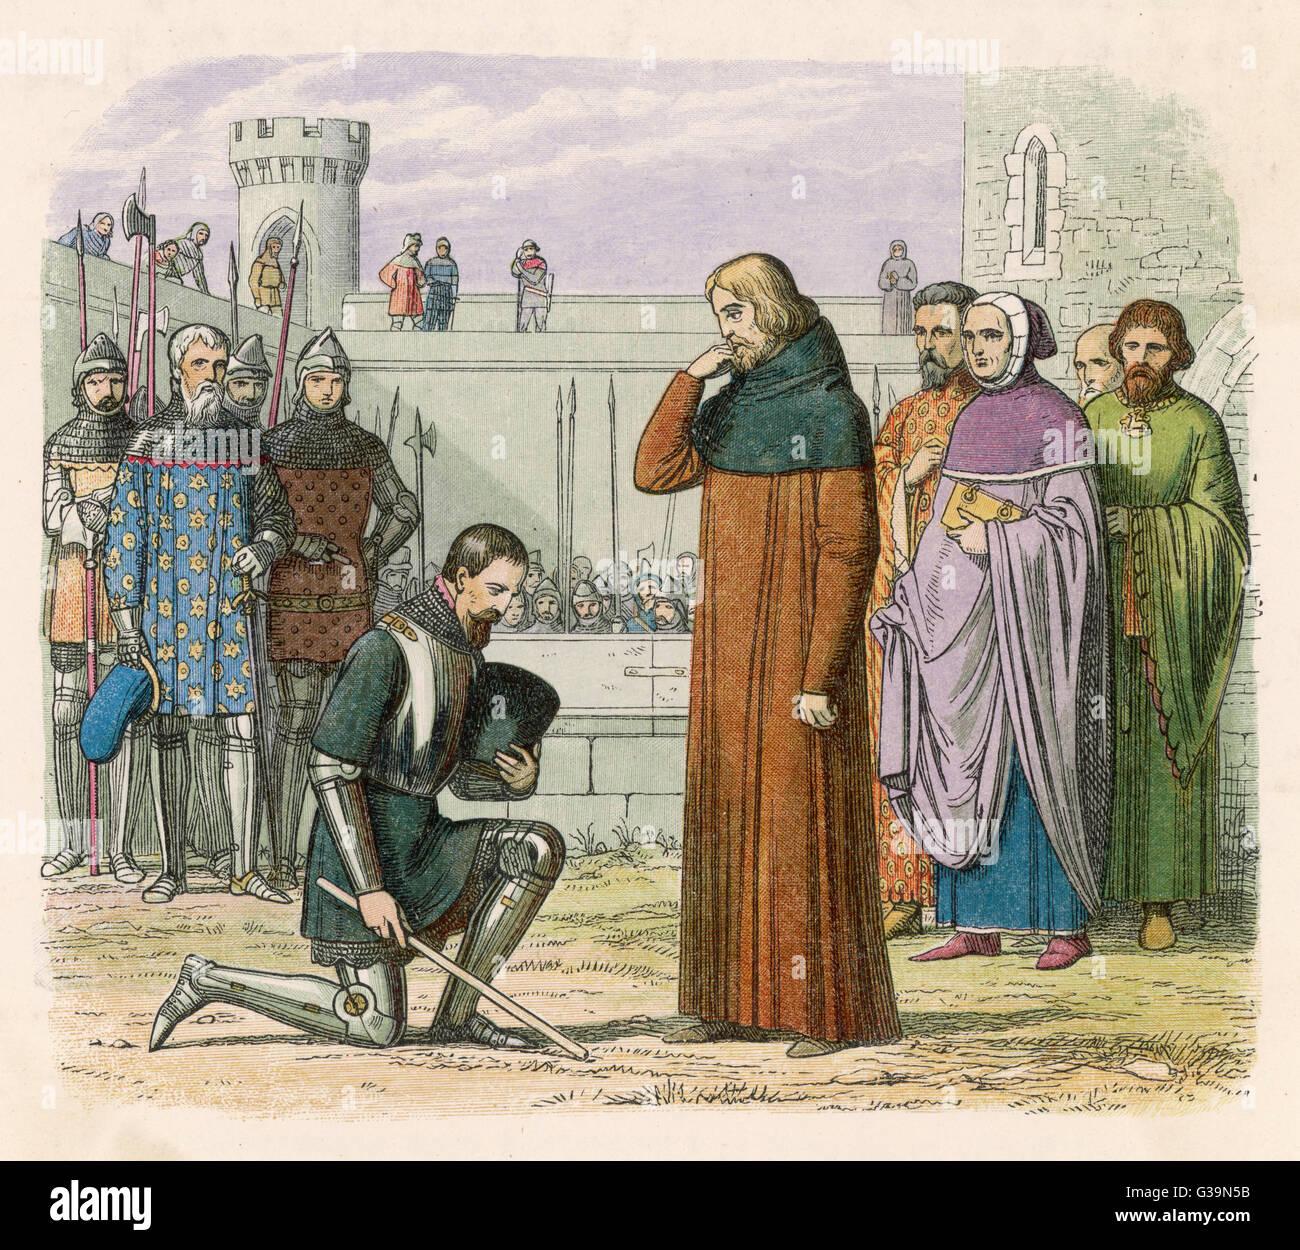 Richard II meets Henry IV at  Flint         Date: 1399 - Stock Image